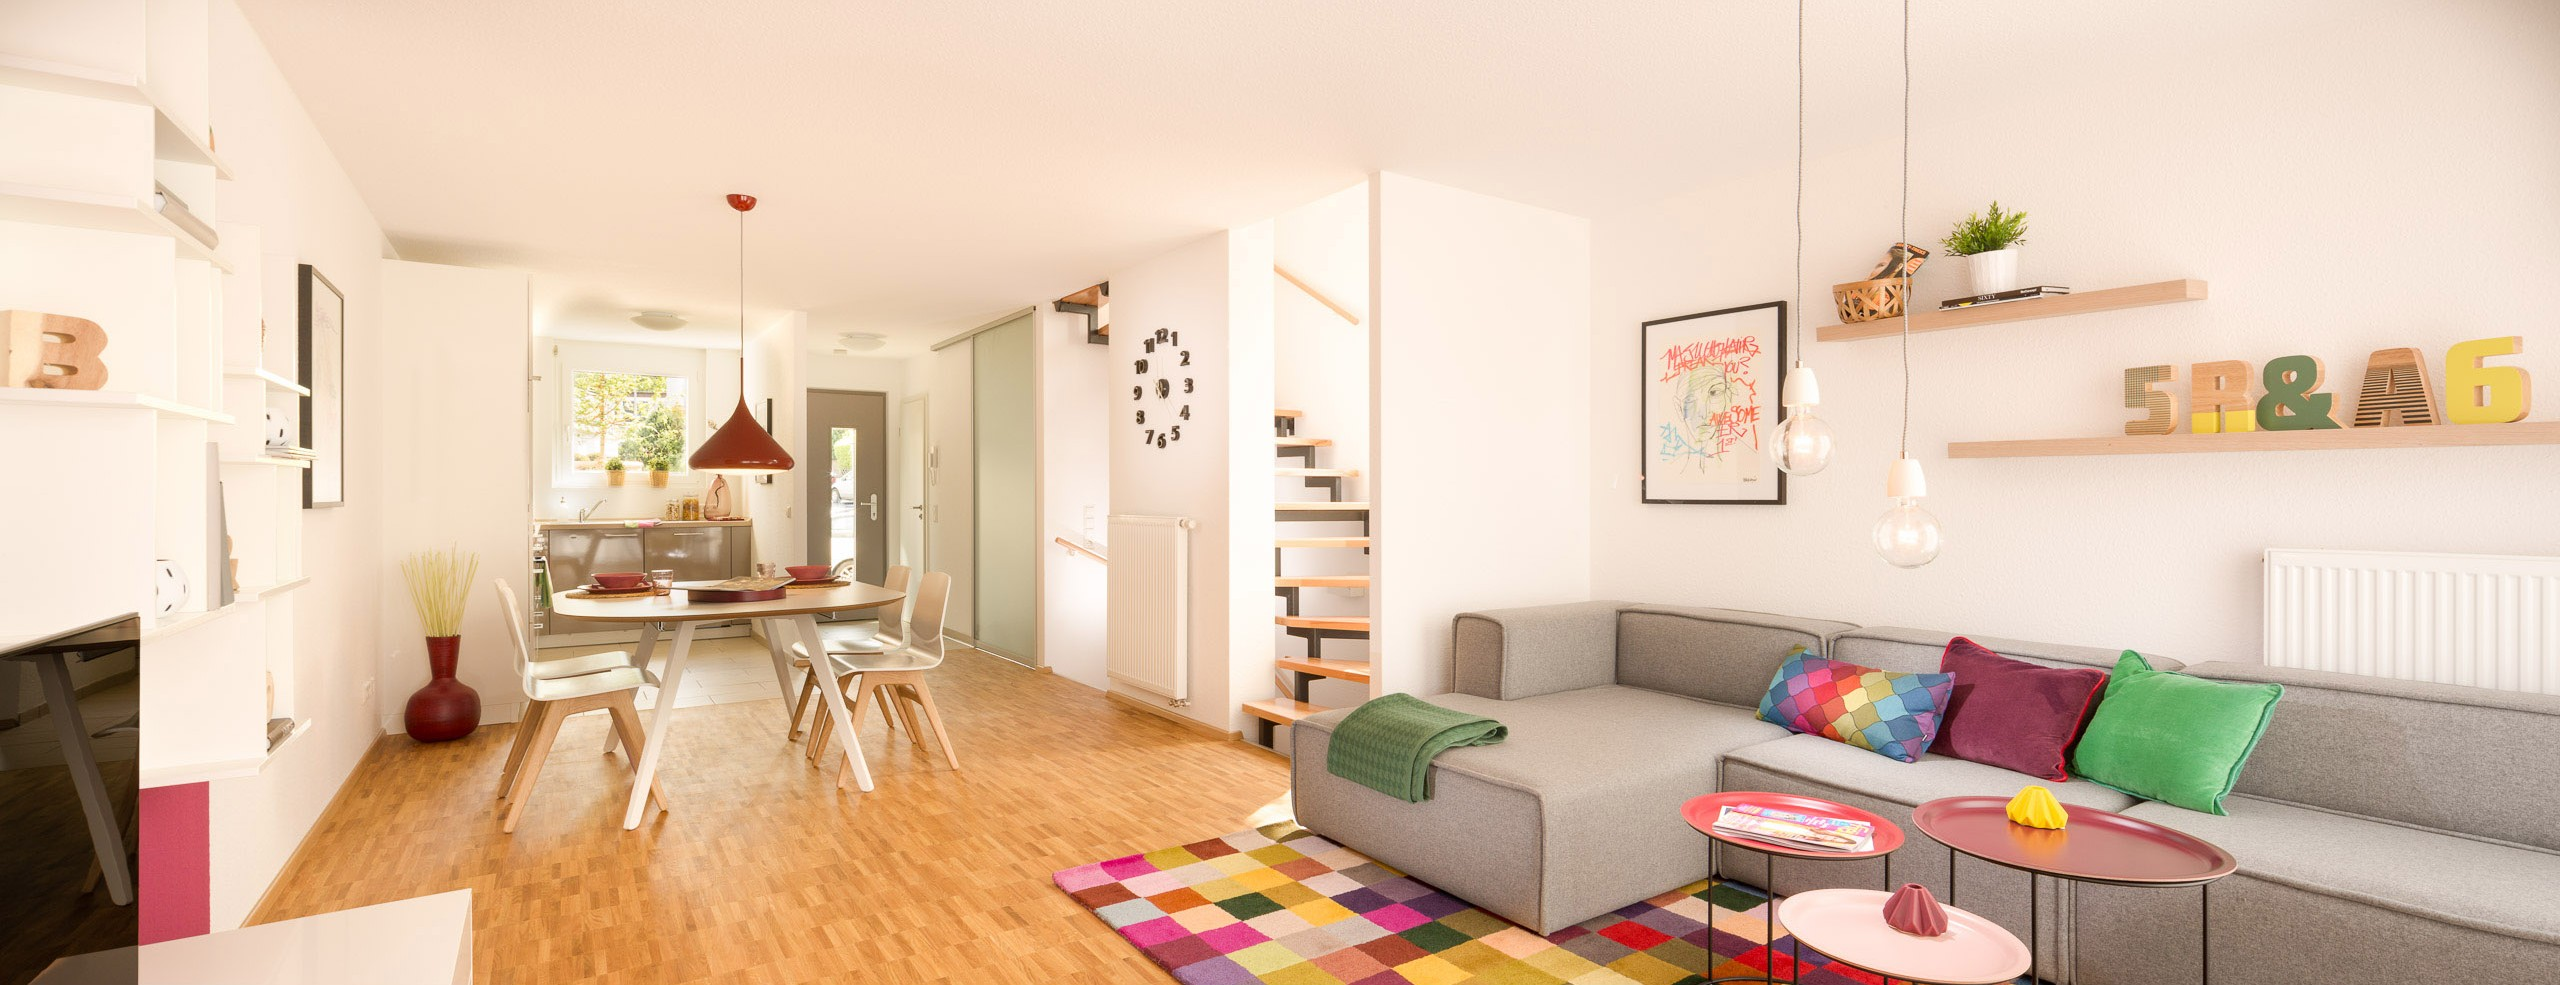 00023-Fotograf-Architektur-Achitecture-interior-Werbefotograf-Stuttgart-Andreas-Martin